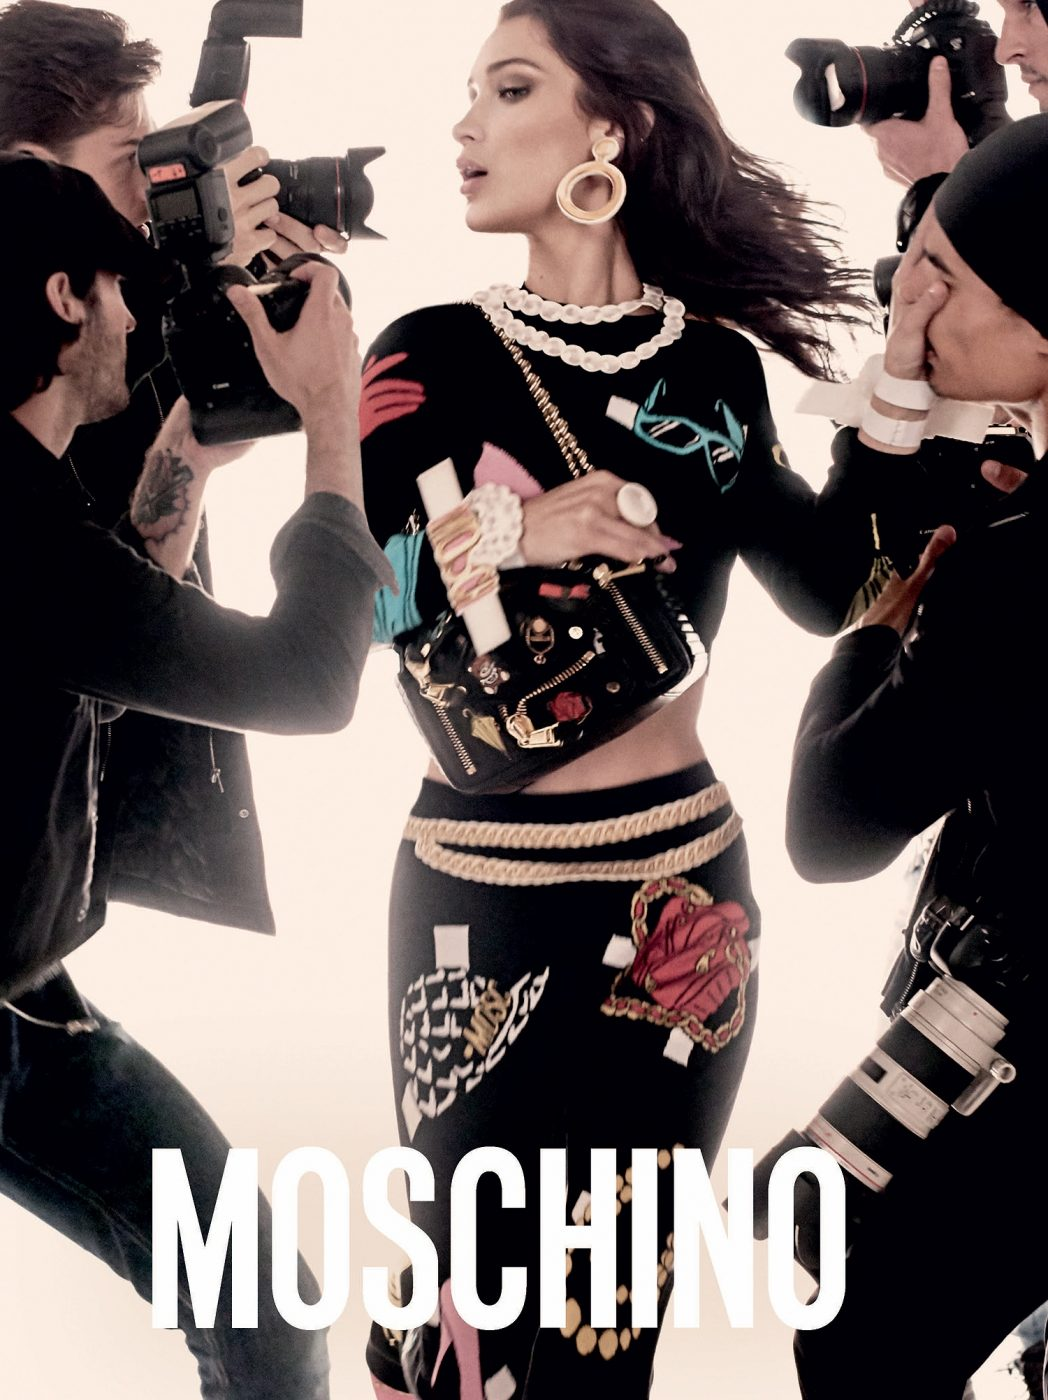 2017 Ad 100 Best Interior Designers Victoria Hagan: Moschino Spring 2017 Ad Campaign